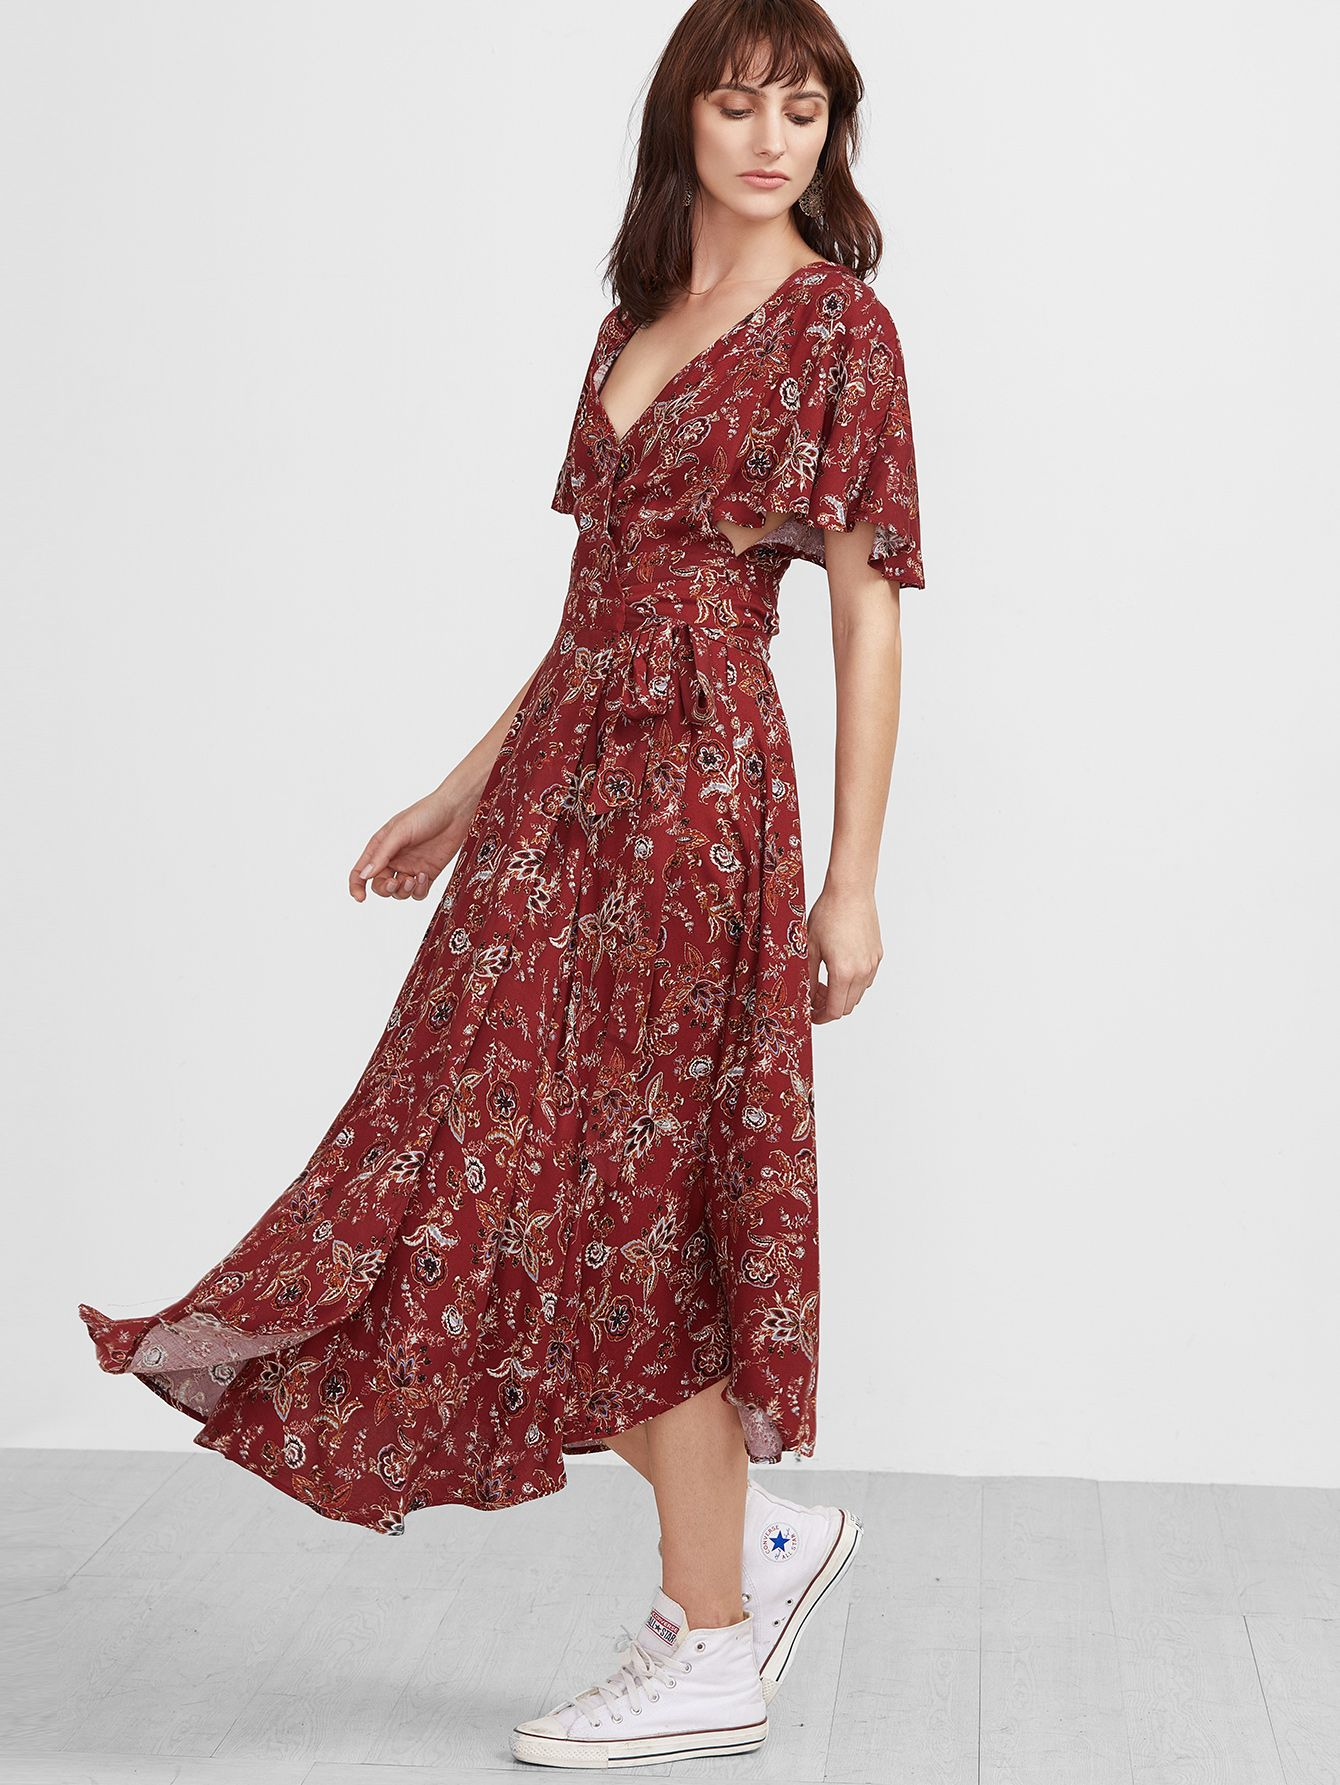 8e12f44e31de Shop Red Florals V Neck Vintage Maxi Dress online. SheIn offers Red Florals V  Neck Vintage Maxi Dress   more to fit your fashionable needs.